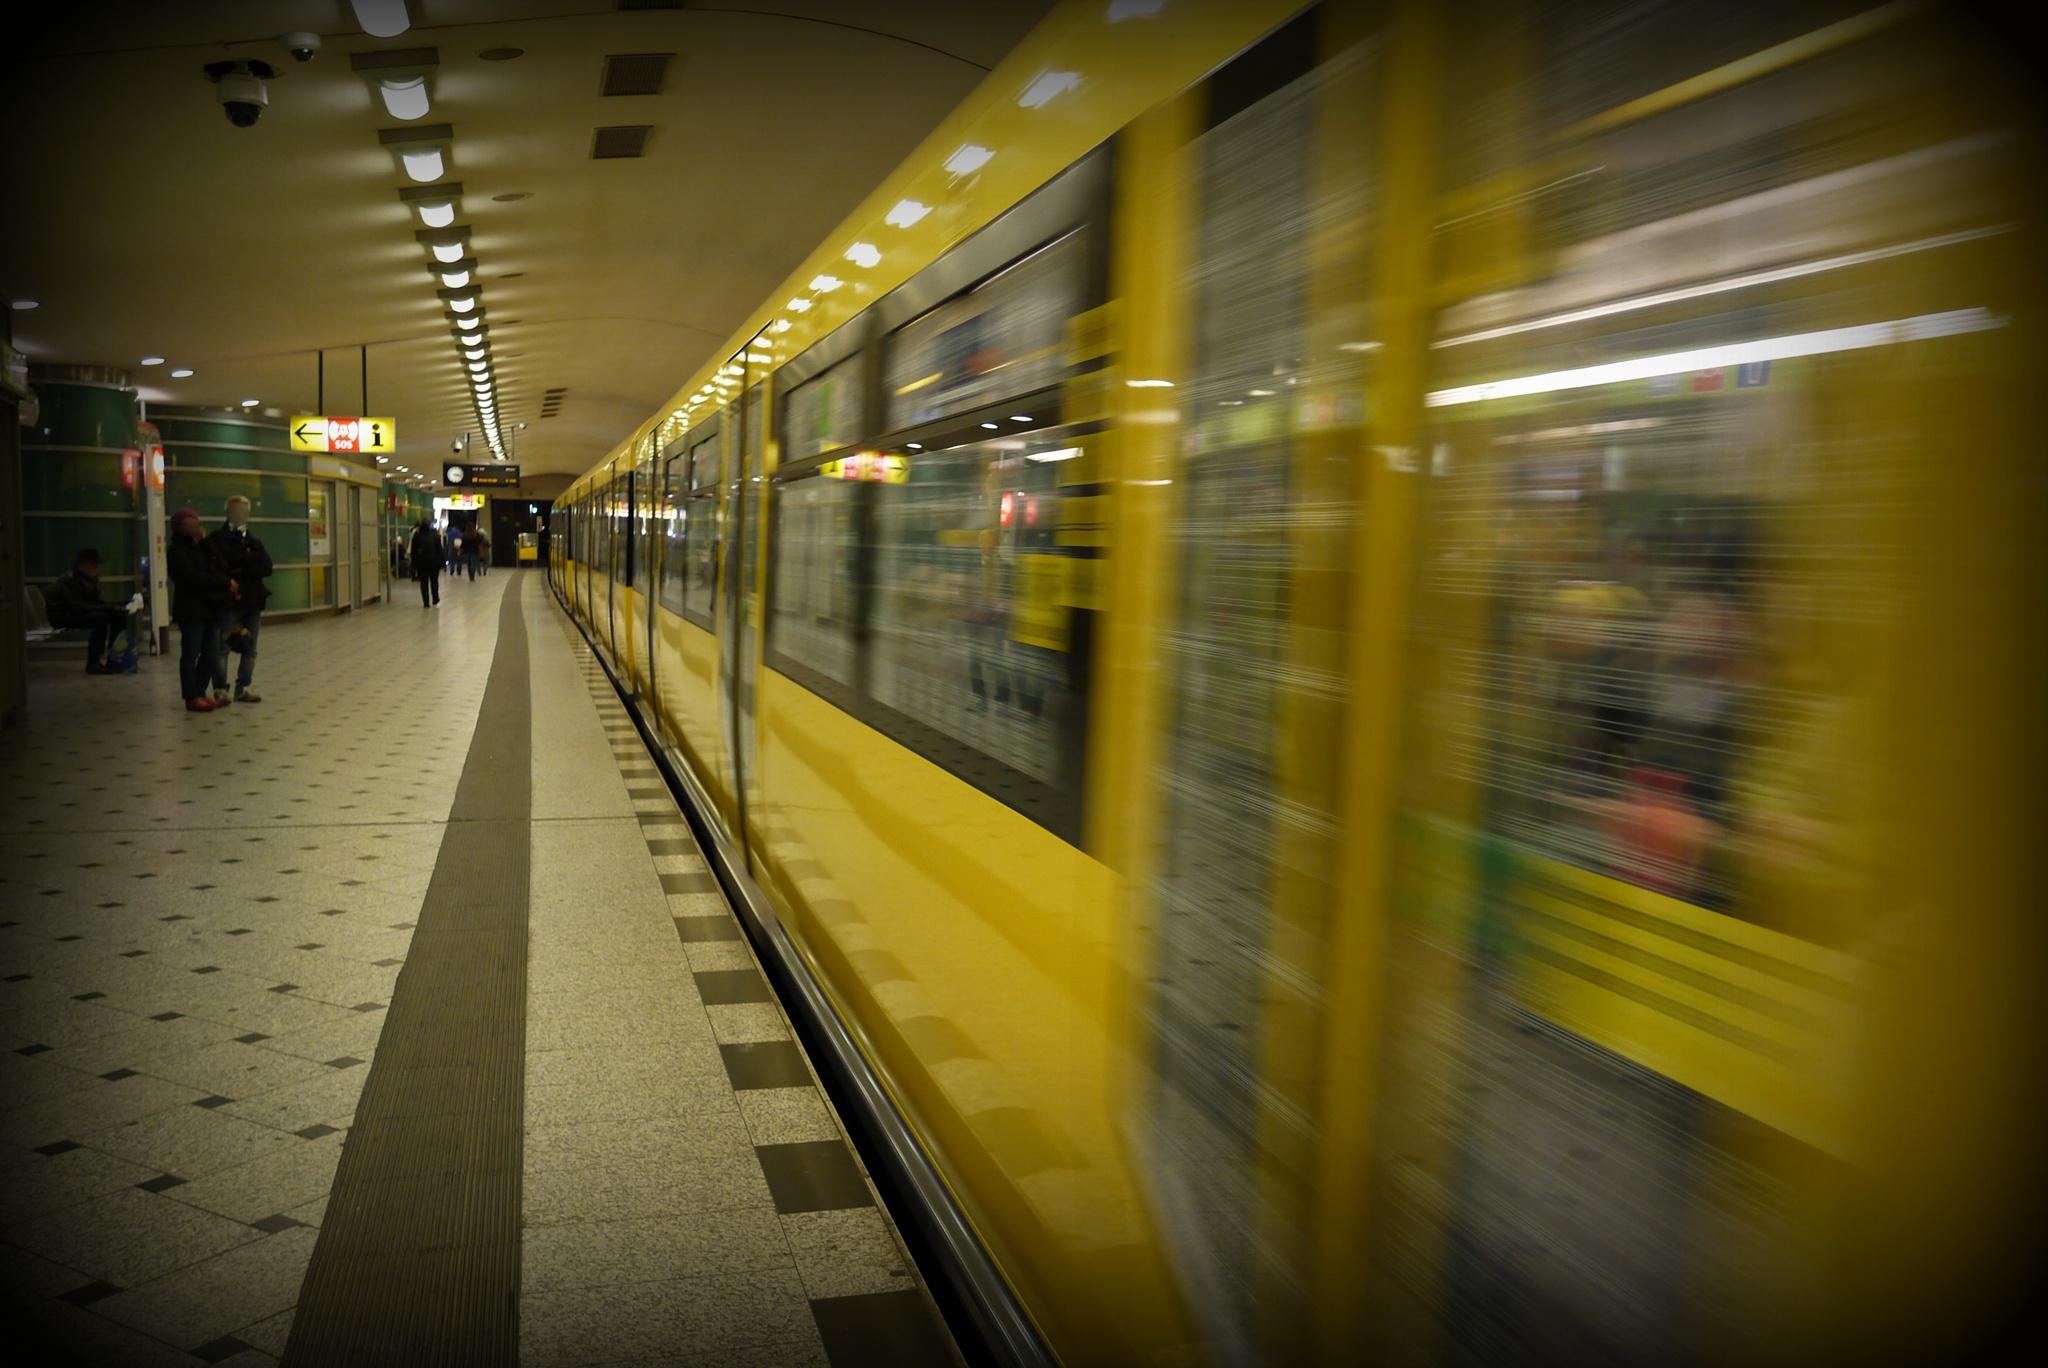 U9 Train leaving Kurfurstendamm station in Berlin  by Seymour White